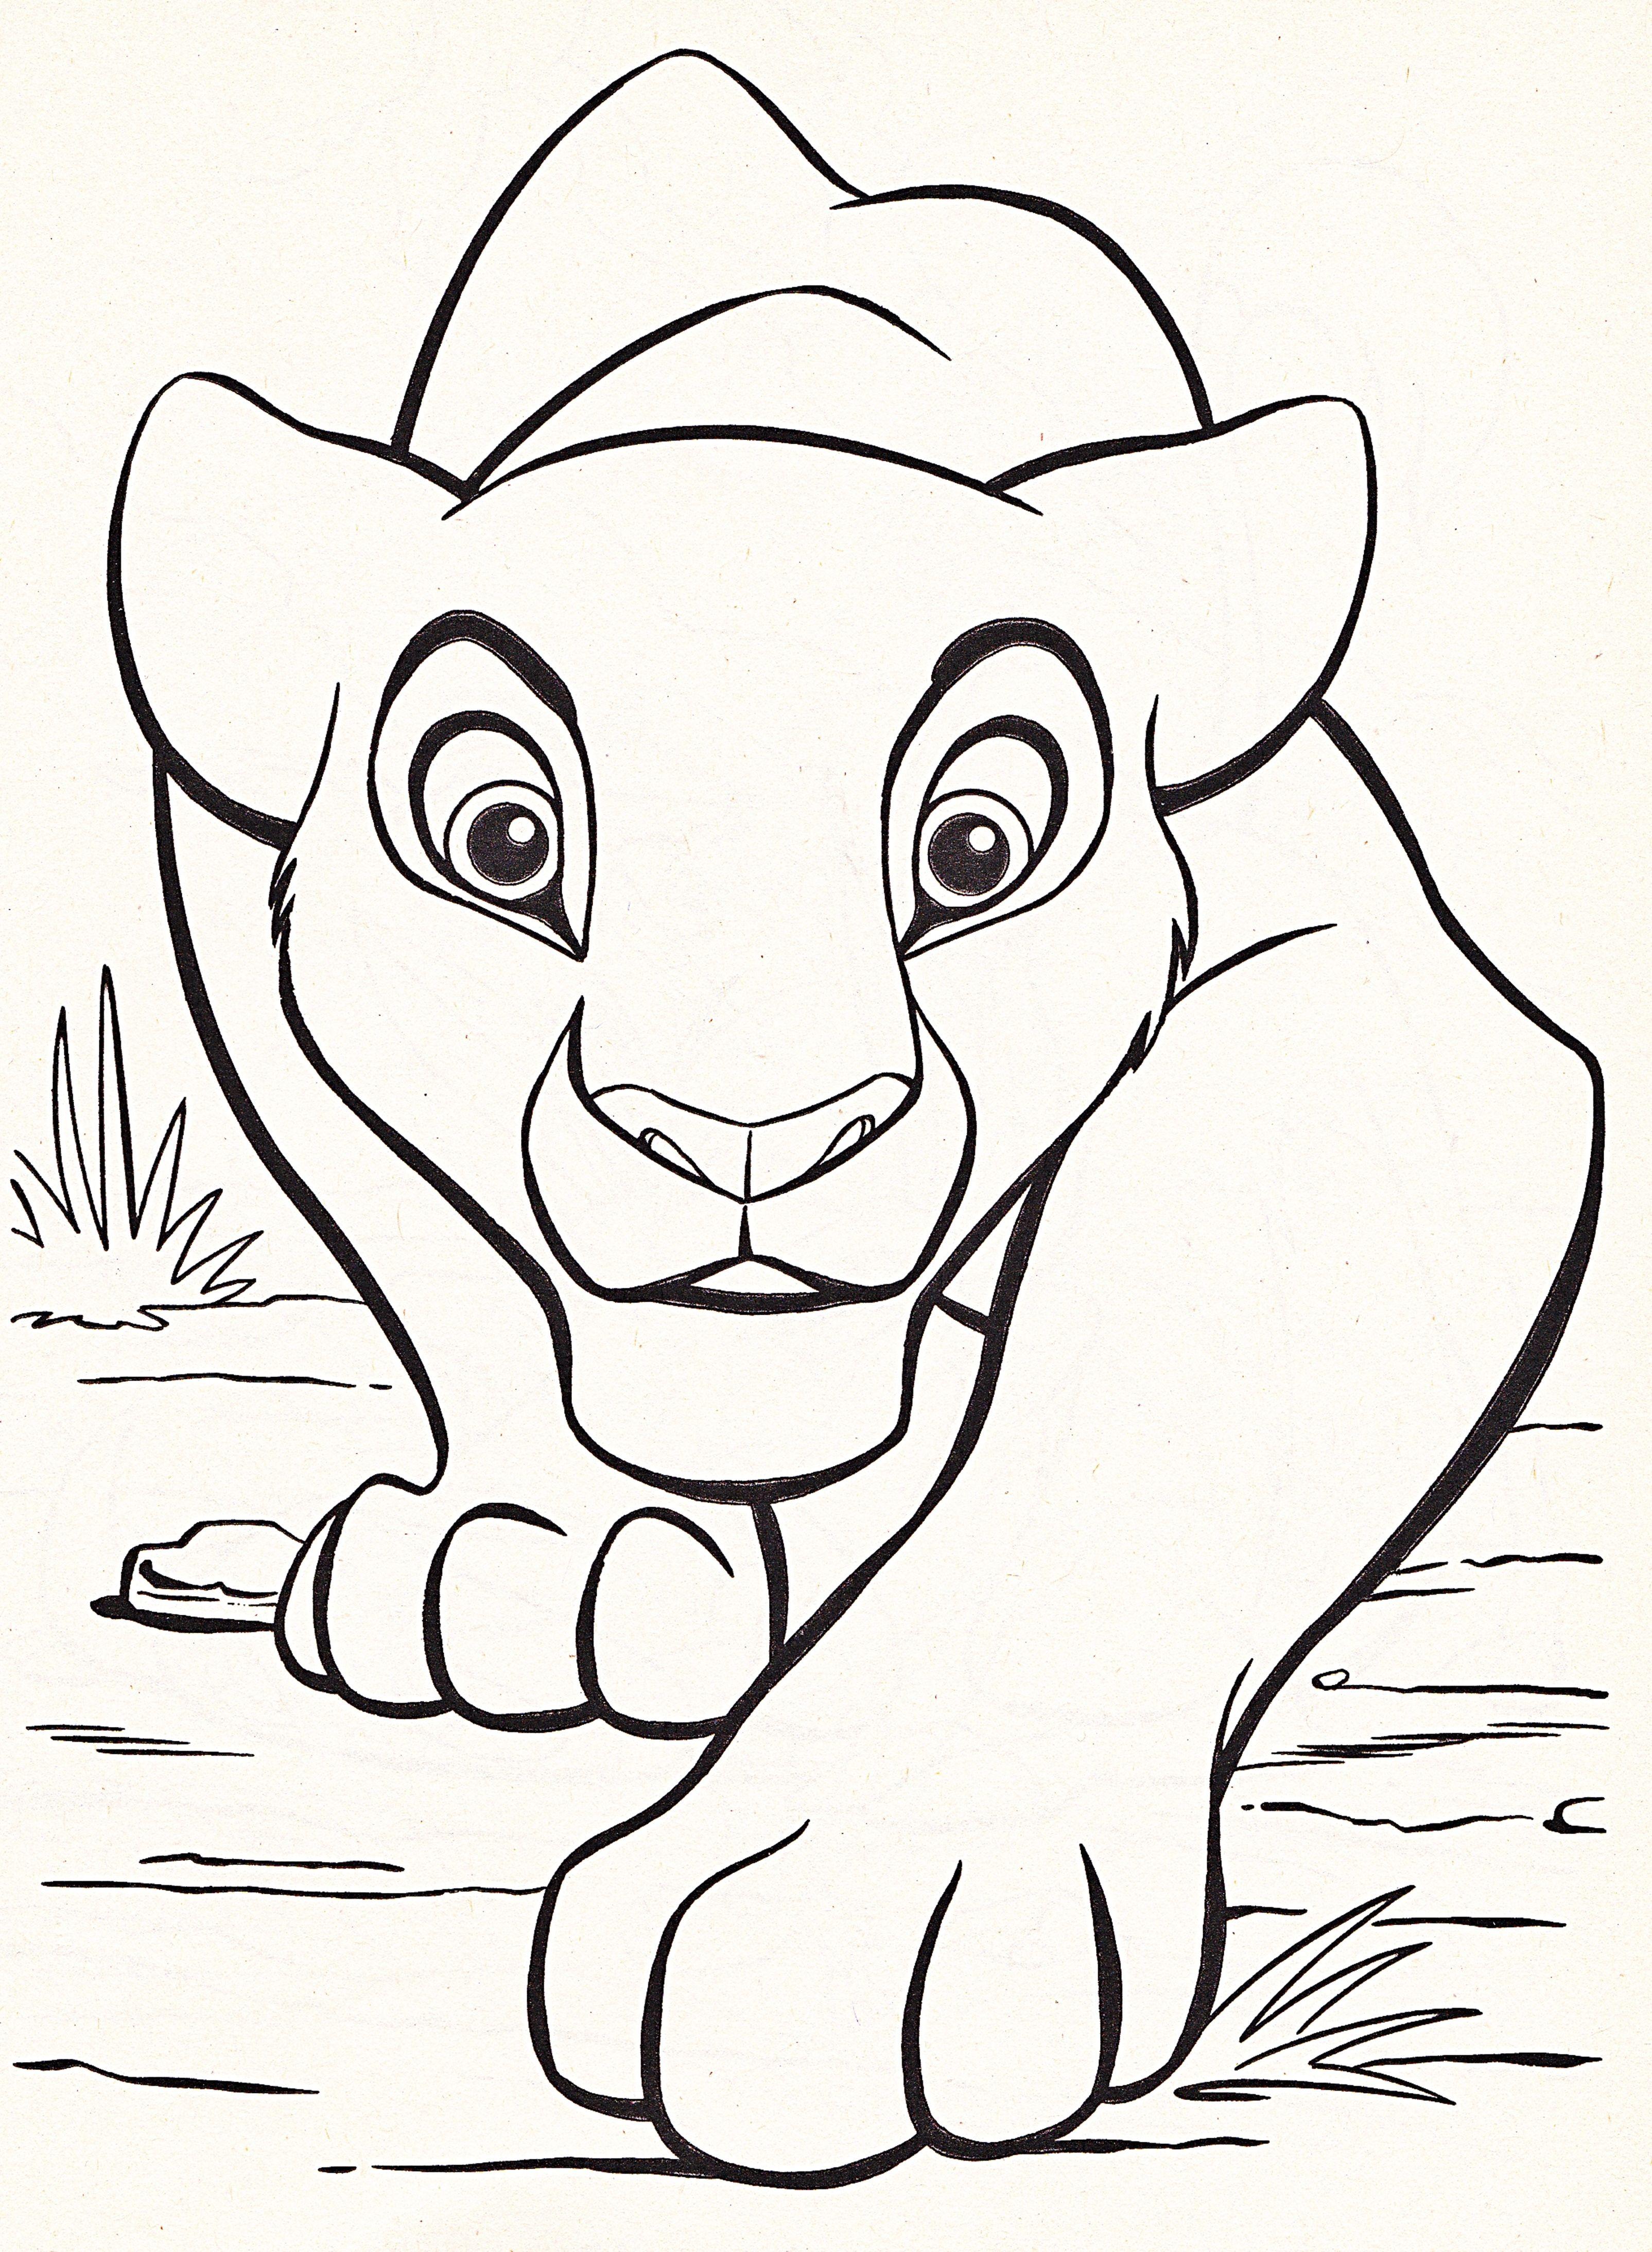 Disney coloring pages lion king free large images kid fun